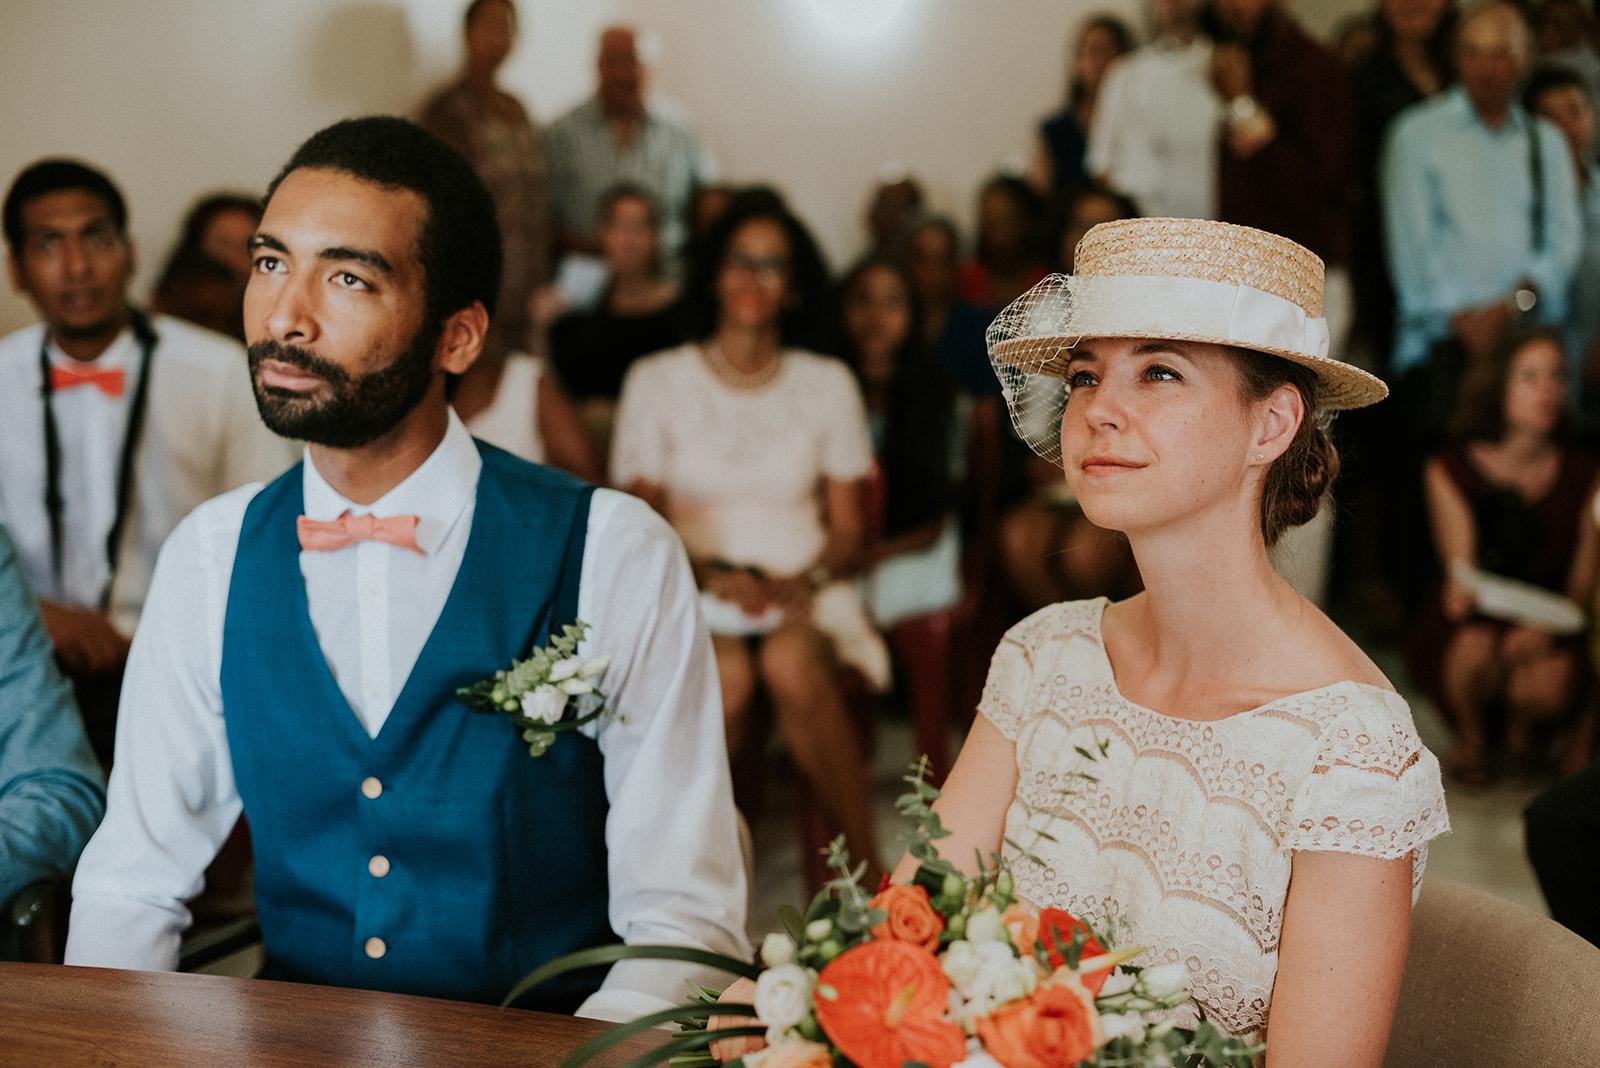 Mariage Bastien et Marie-289.jpg